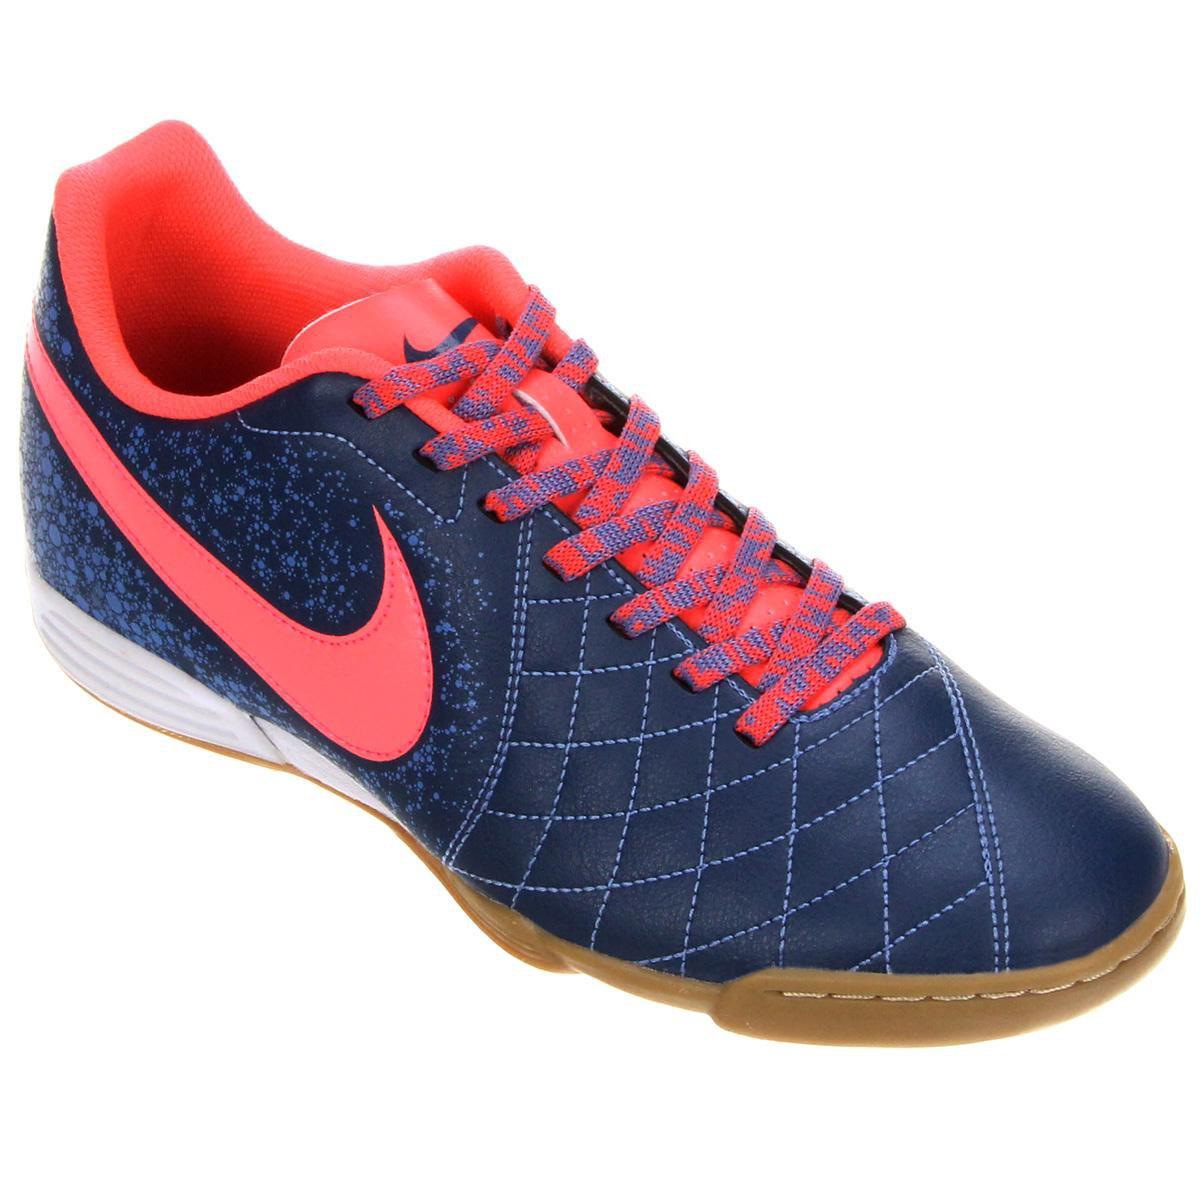 Chuteira Nike Flare 2 IC - Compre Agora  0802918915910